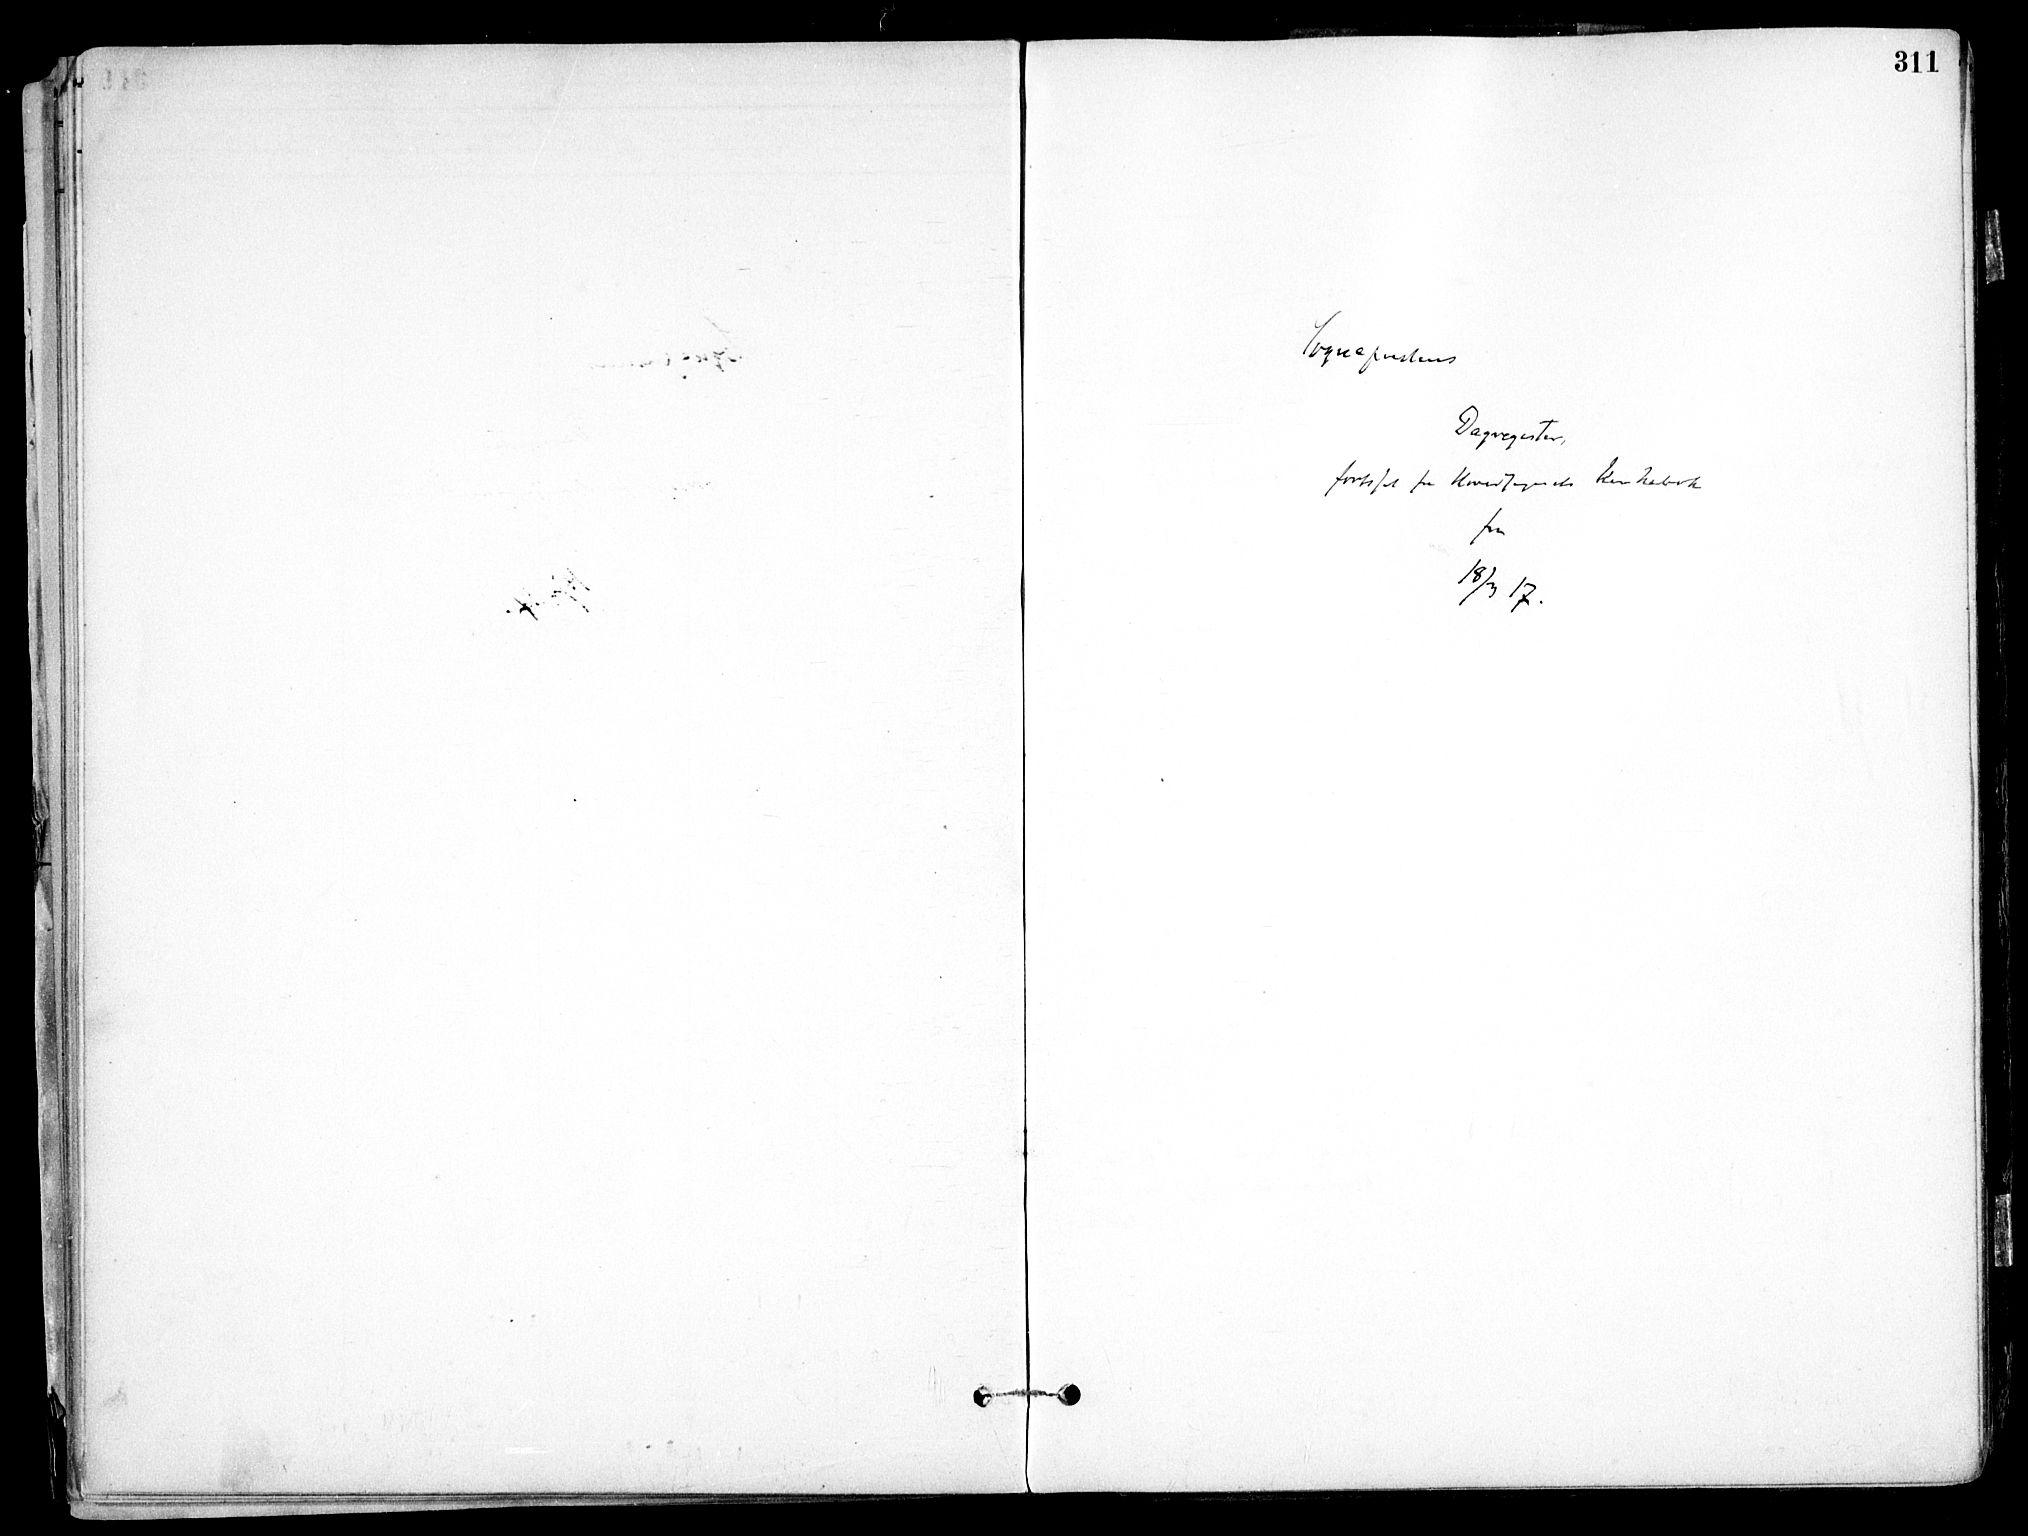 SAO, Nes prestekontor Kirkebøker, F/Fb/L0002: Ministerialbok nr. II 2, 1883-1918, s. 311